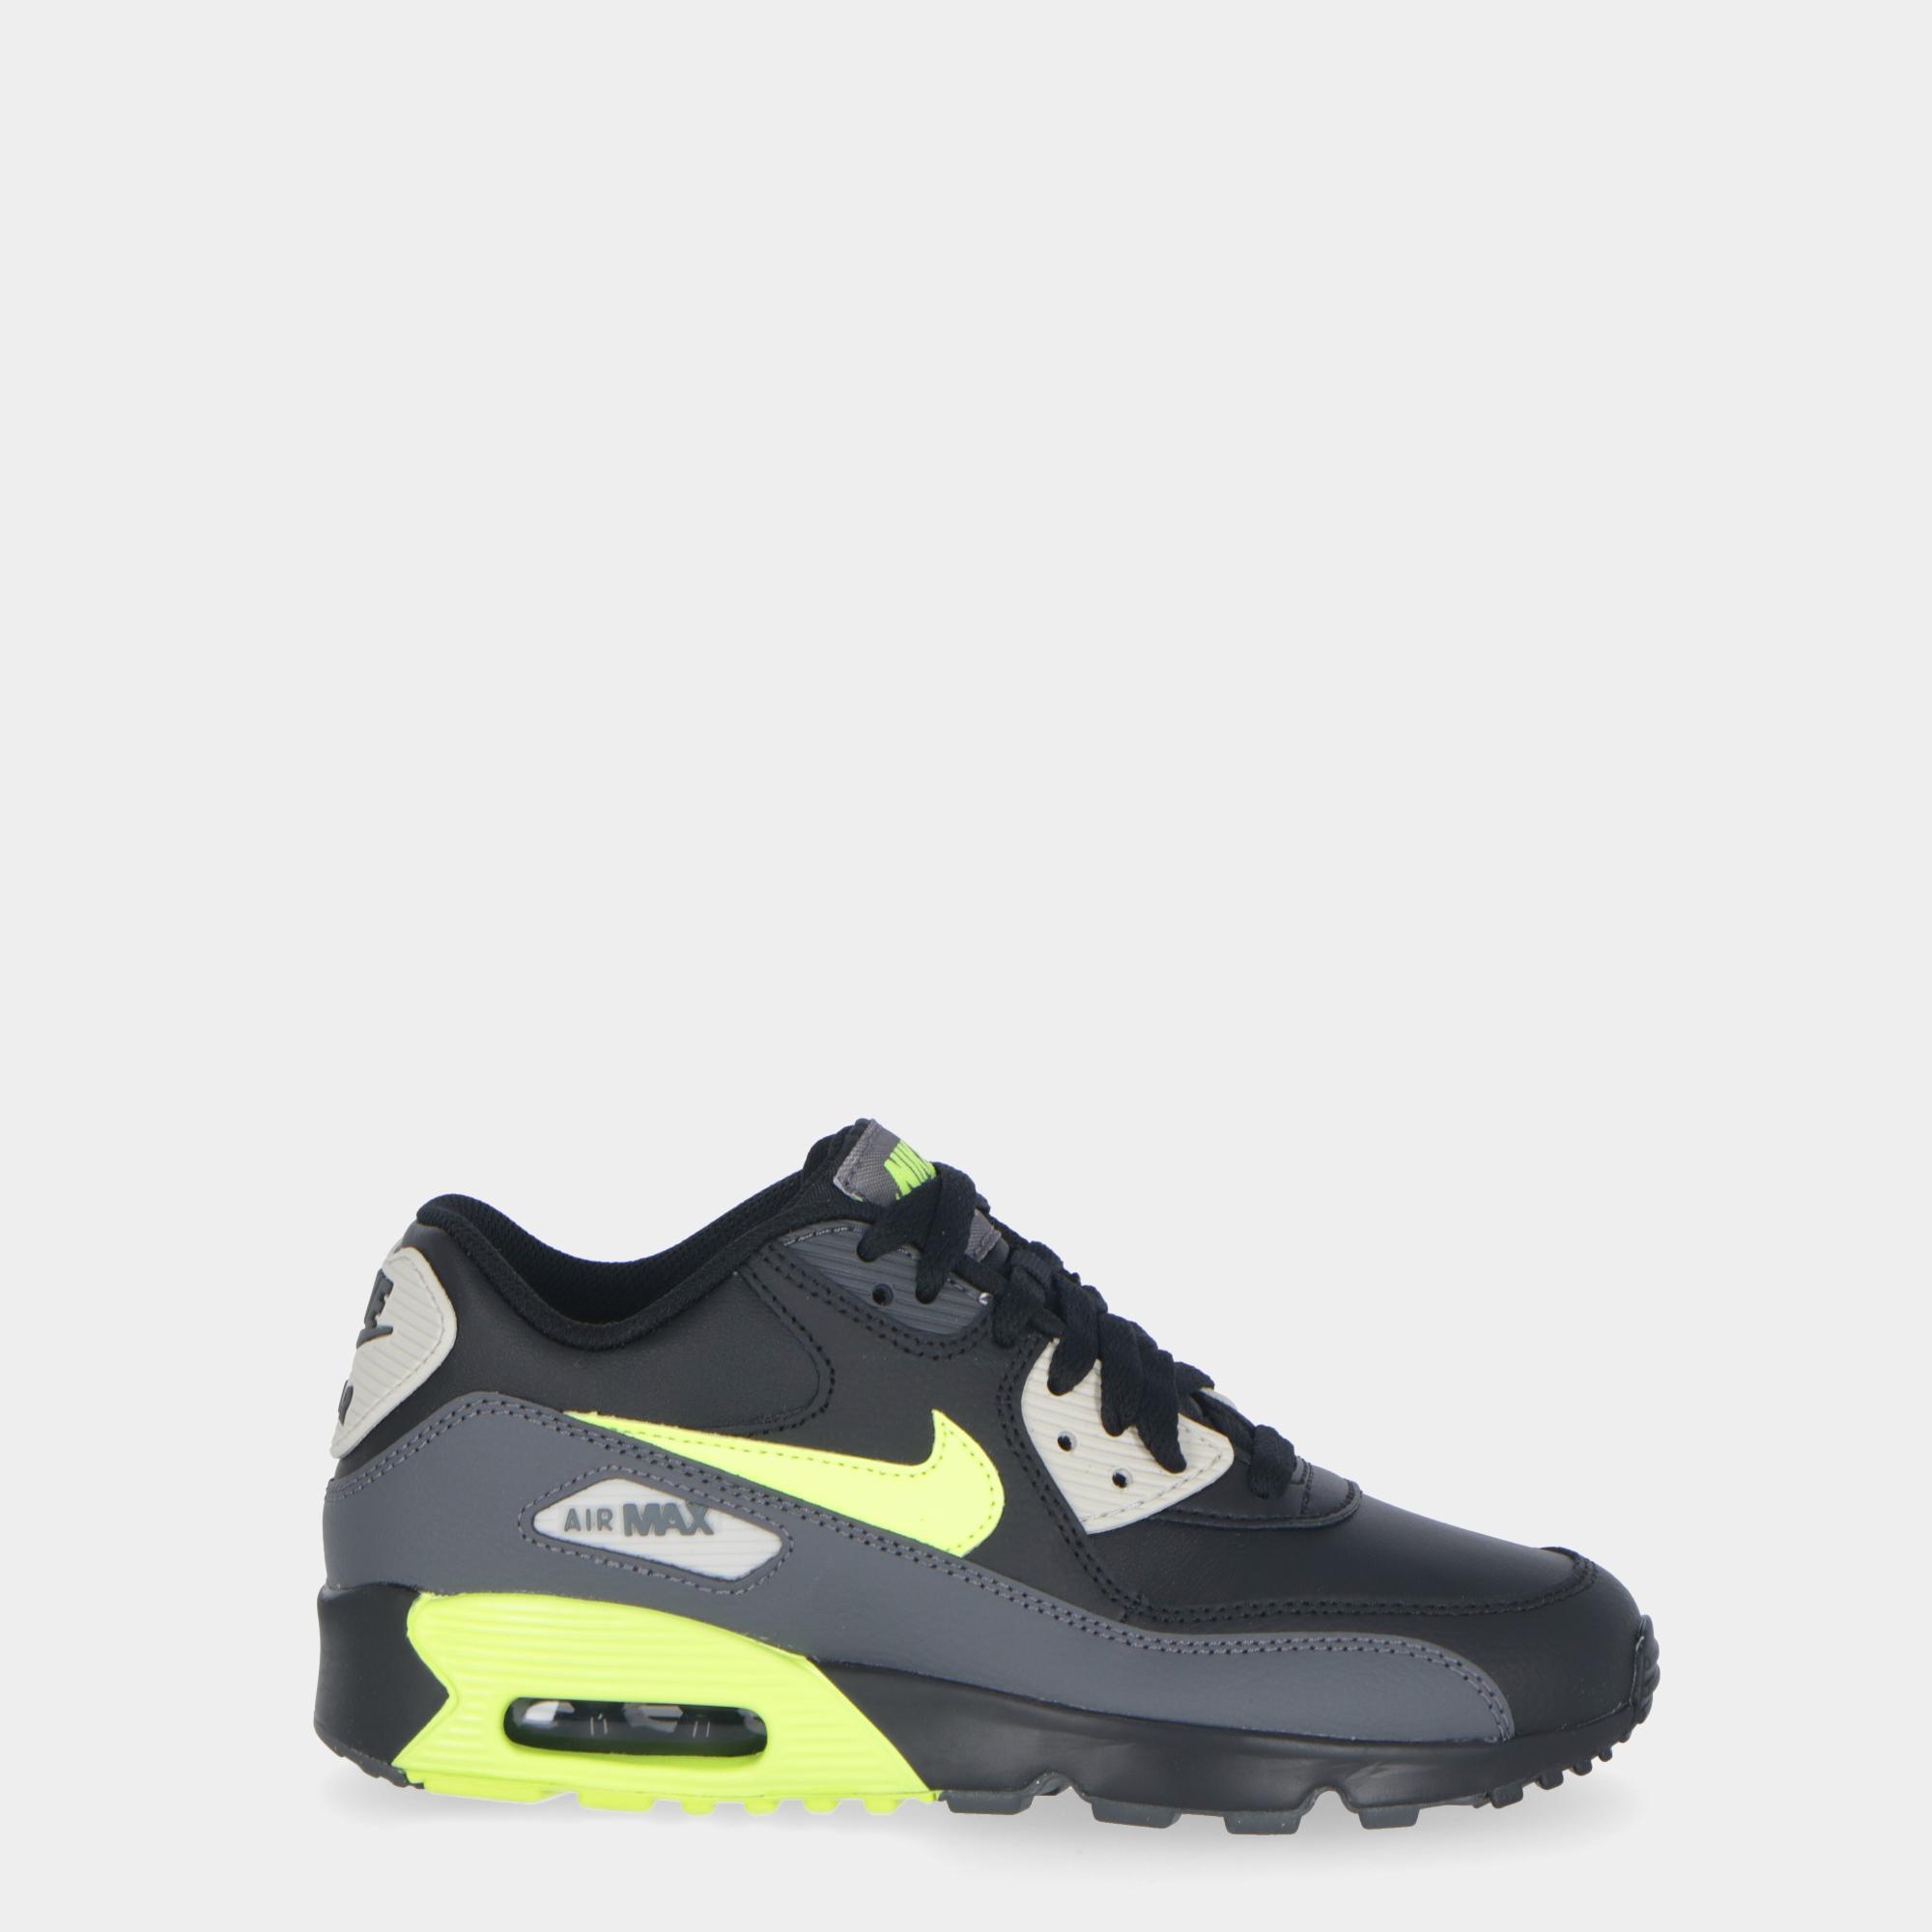 the best attitude efcec 04a6b Nike Air Max 90 Leather (gs) - Kids D grey volt